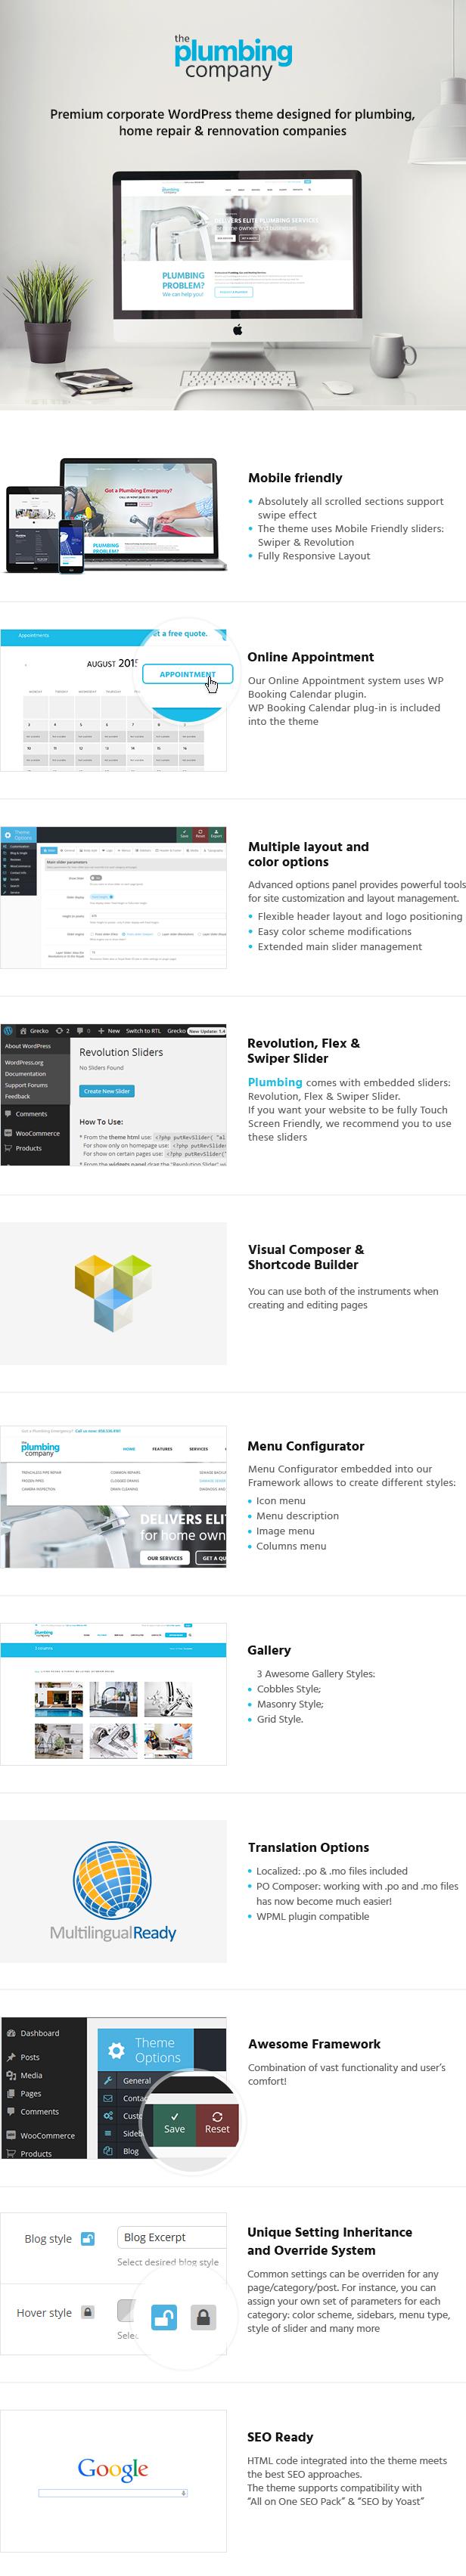 Plumbing - Repair, Building & Construction Wordpress Theme - 3